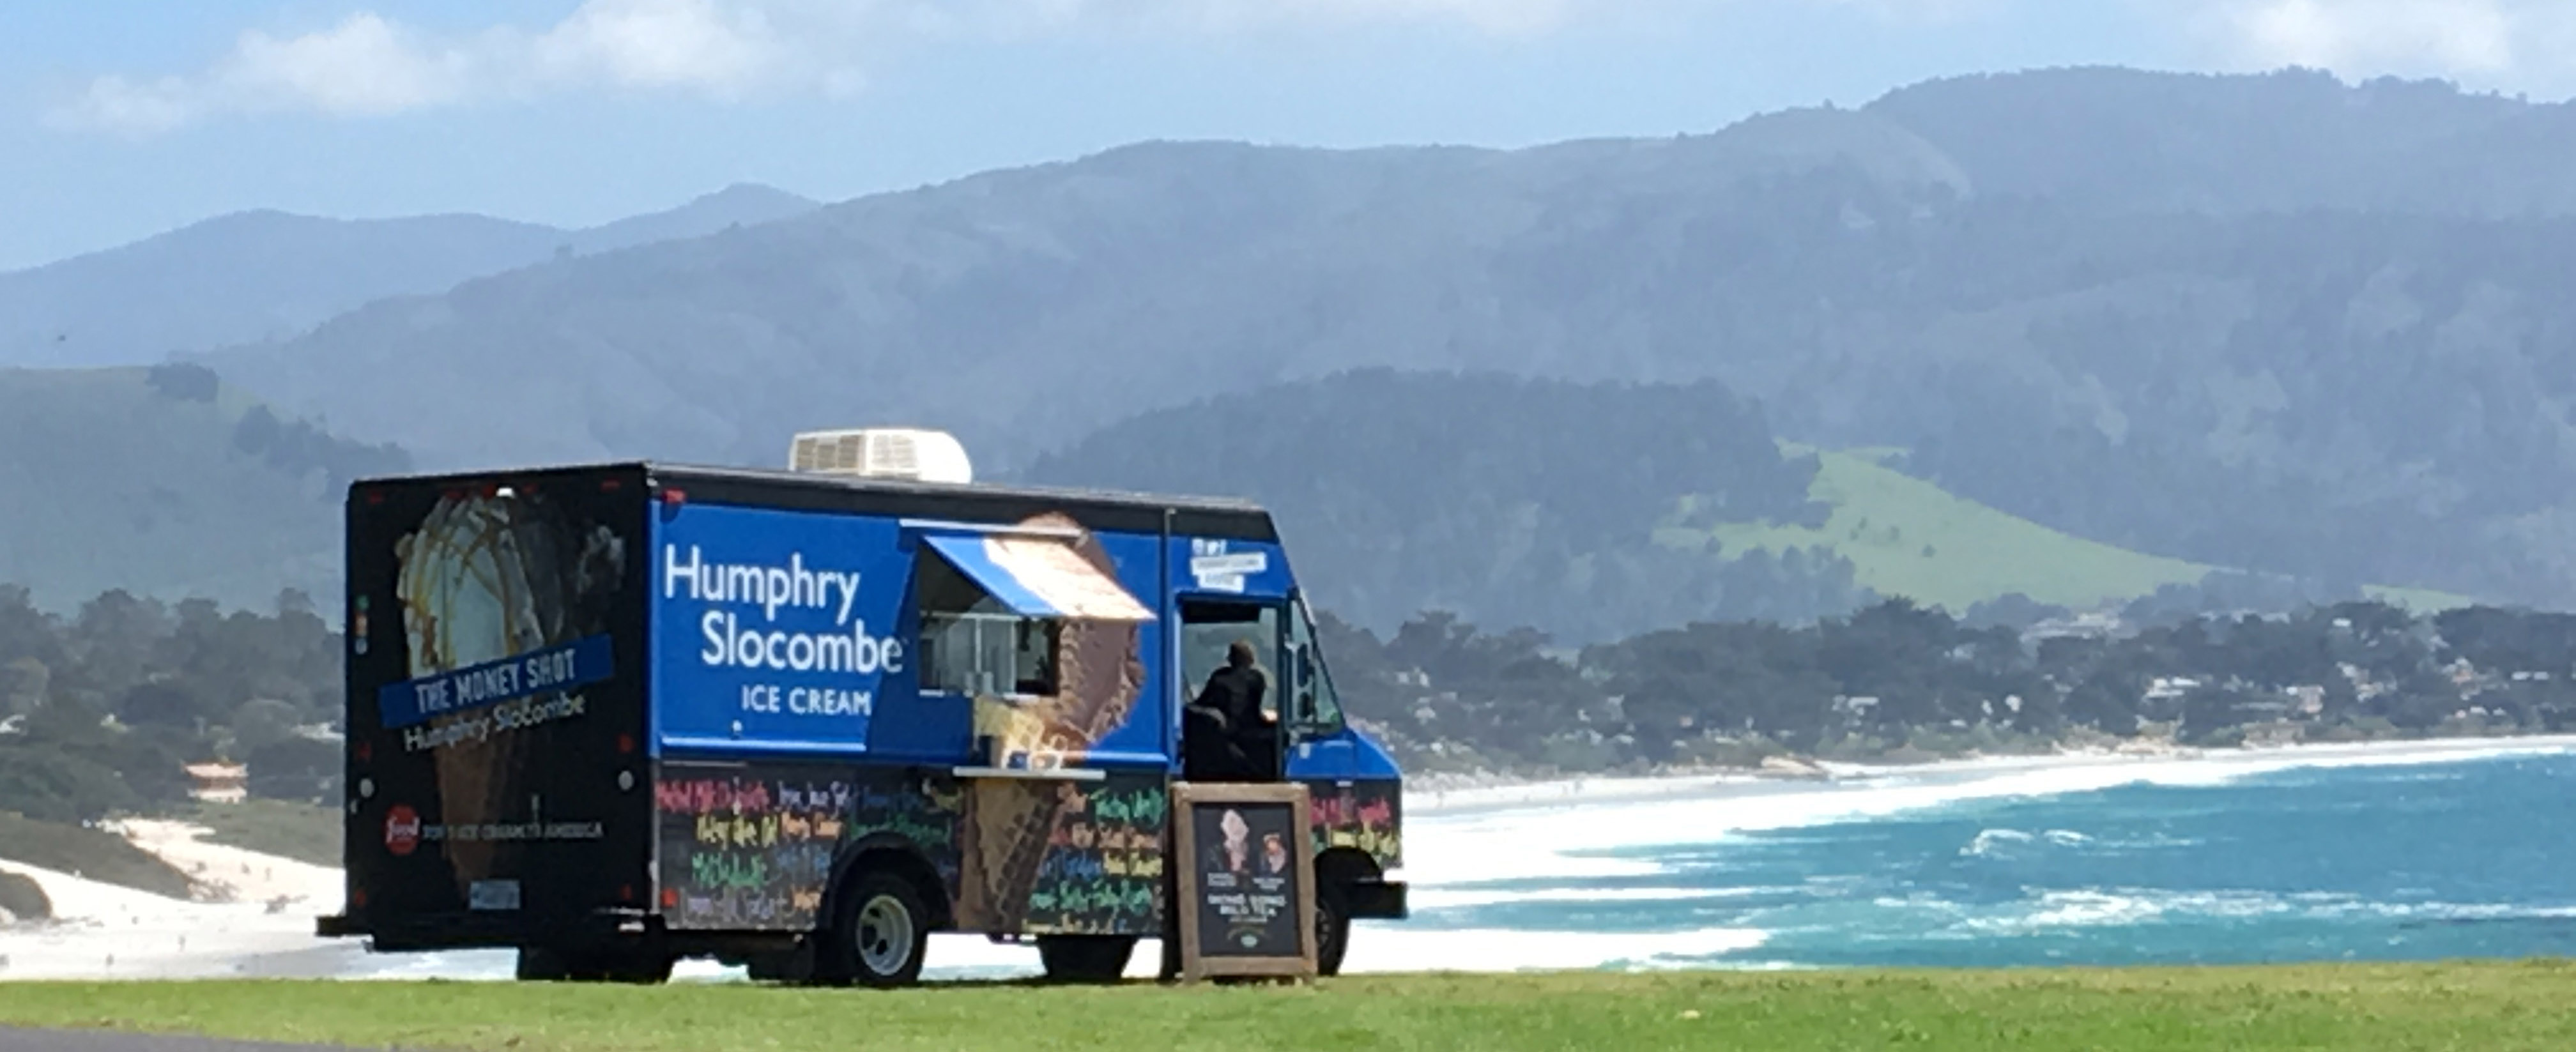 Meet Betty, The Humphrey Slocombe Ice Cream Truck